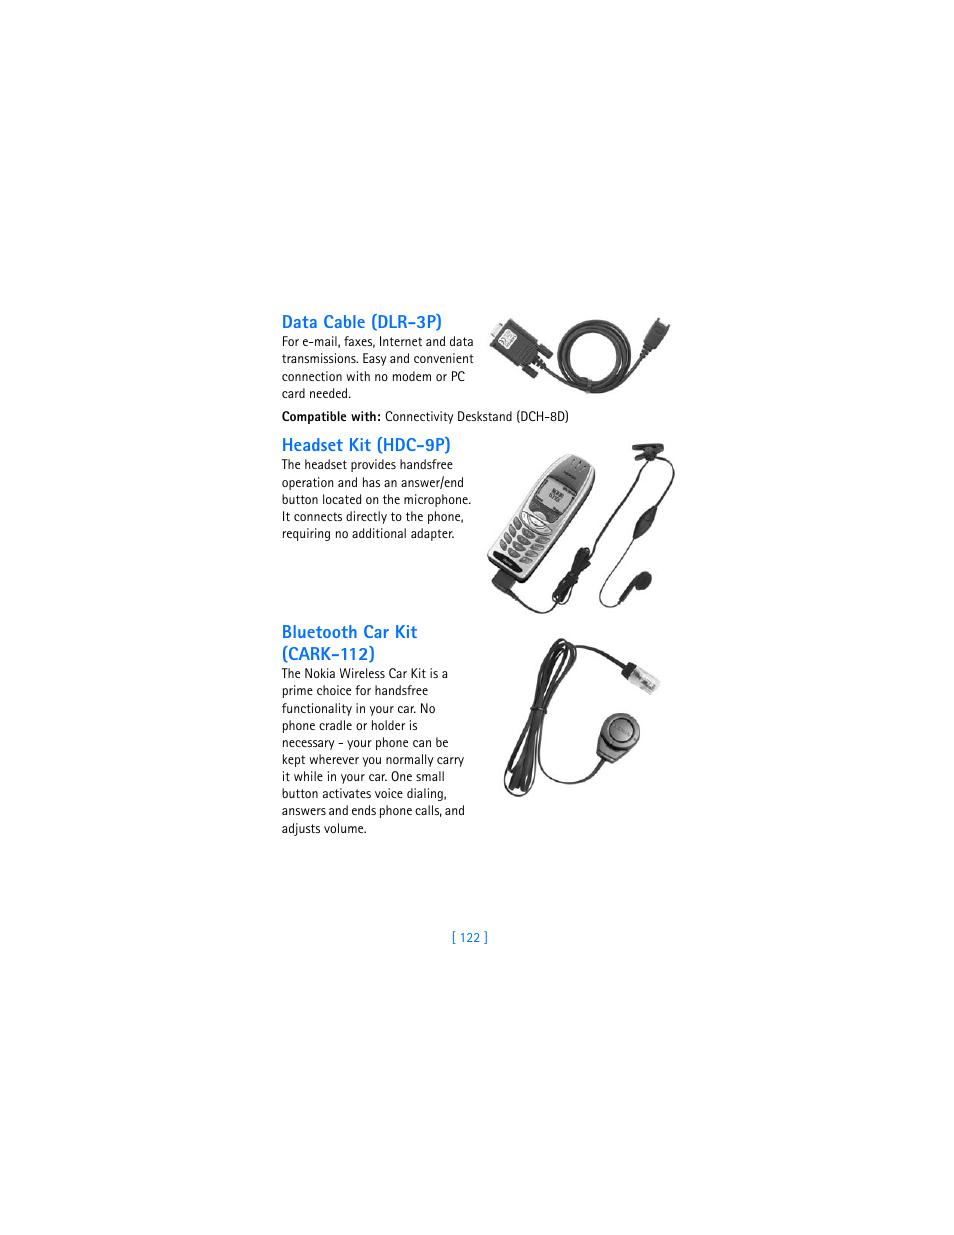 Nokia 6310i Car Kit Wiring Diagram Virtual Fretboard Data Cable Dlr 3p Headset Hdc 9p Bluetooth Cark